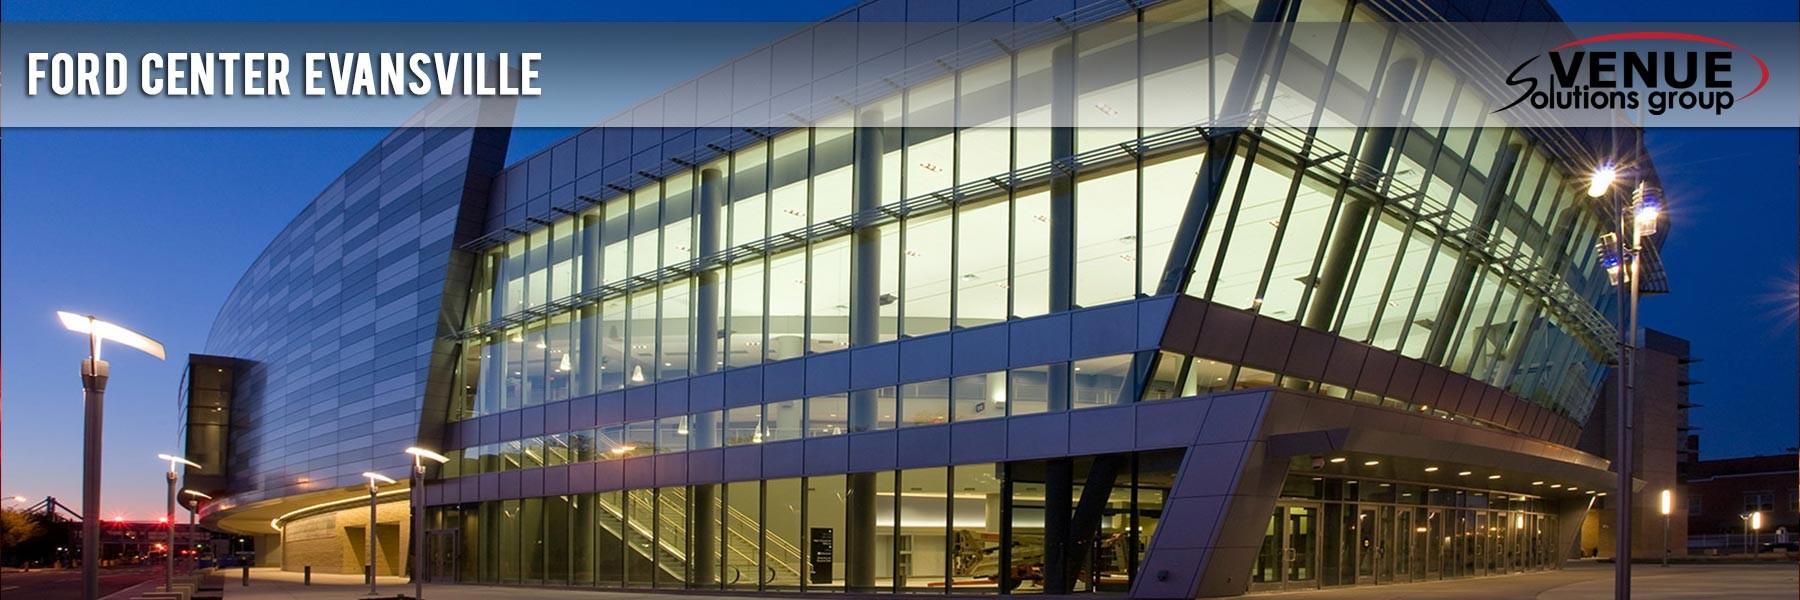 Ford Center Evansville